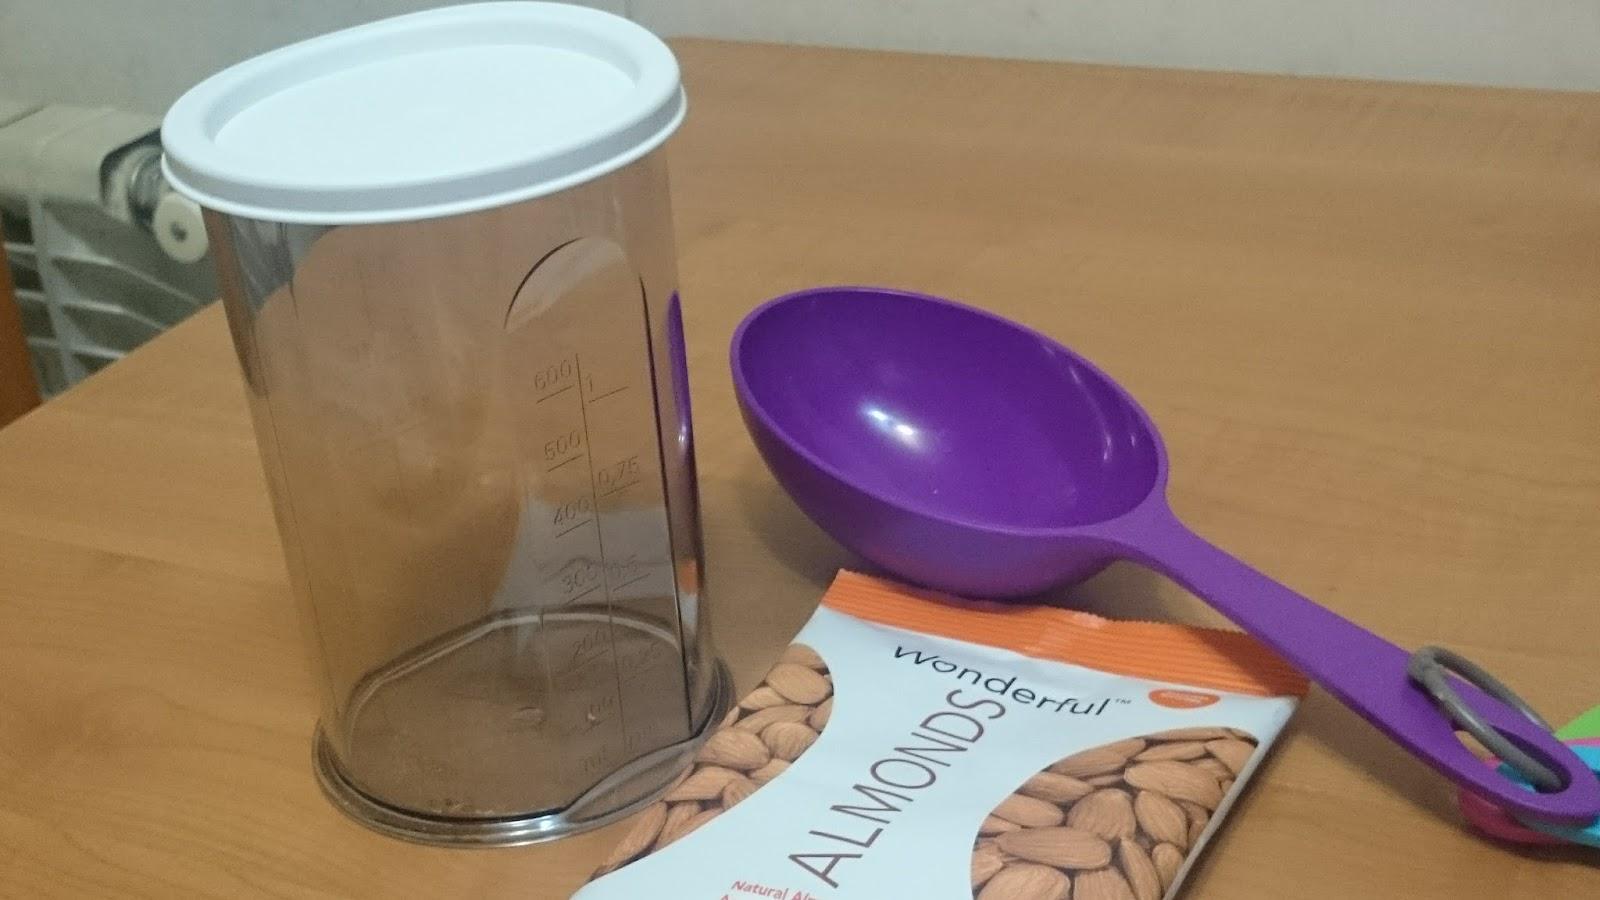 Mi diario de recetas y reposteria creativa - Ingredientes reposteria creativa ...